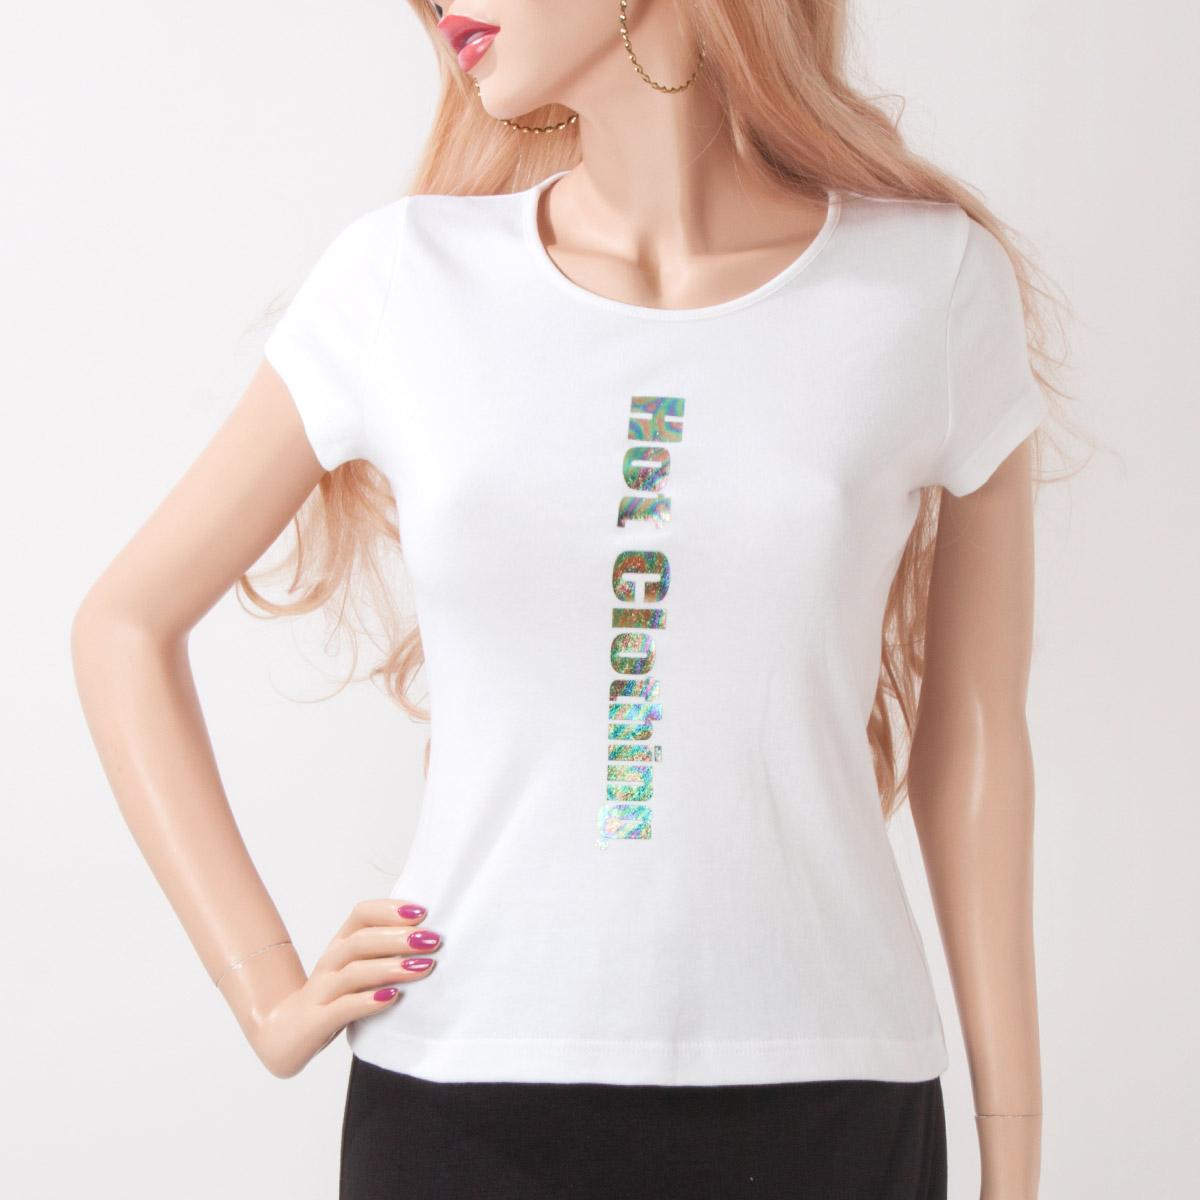 HotClothingオリジナル オーロラロゴマーク入り ラウンドネックTシャツ -hot-tp8233